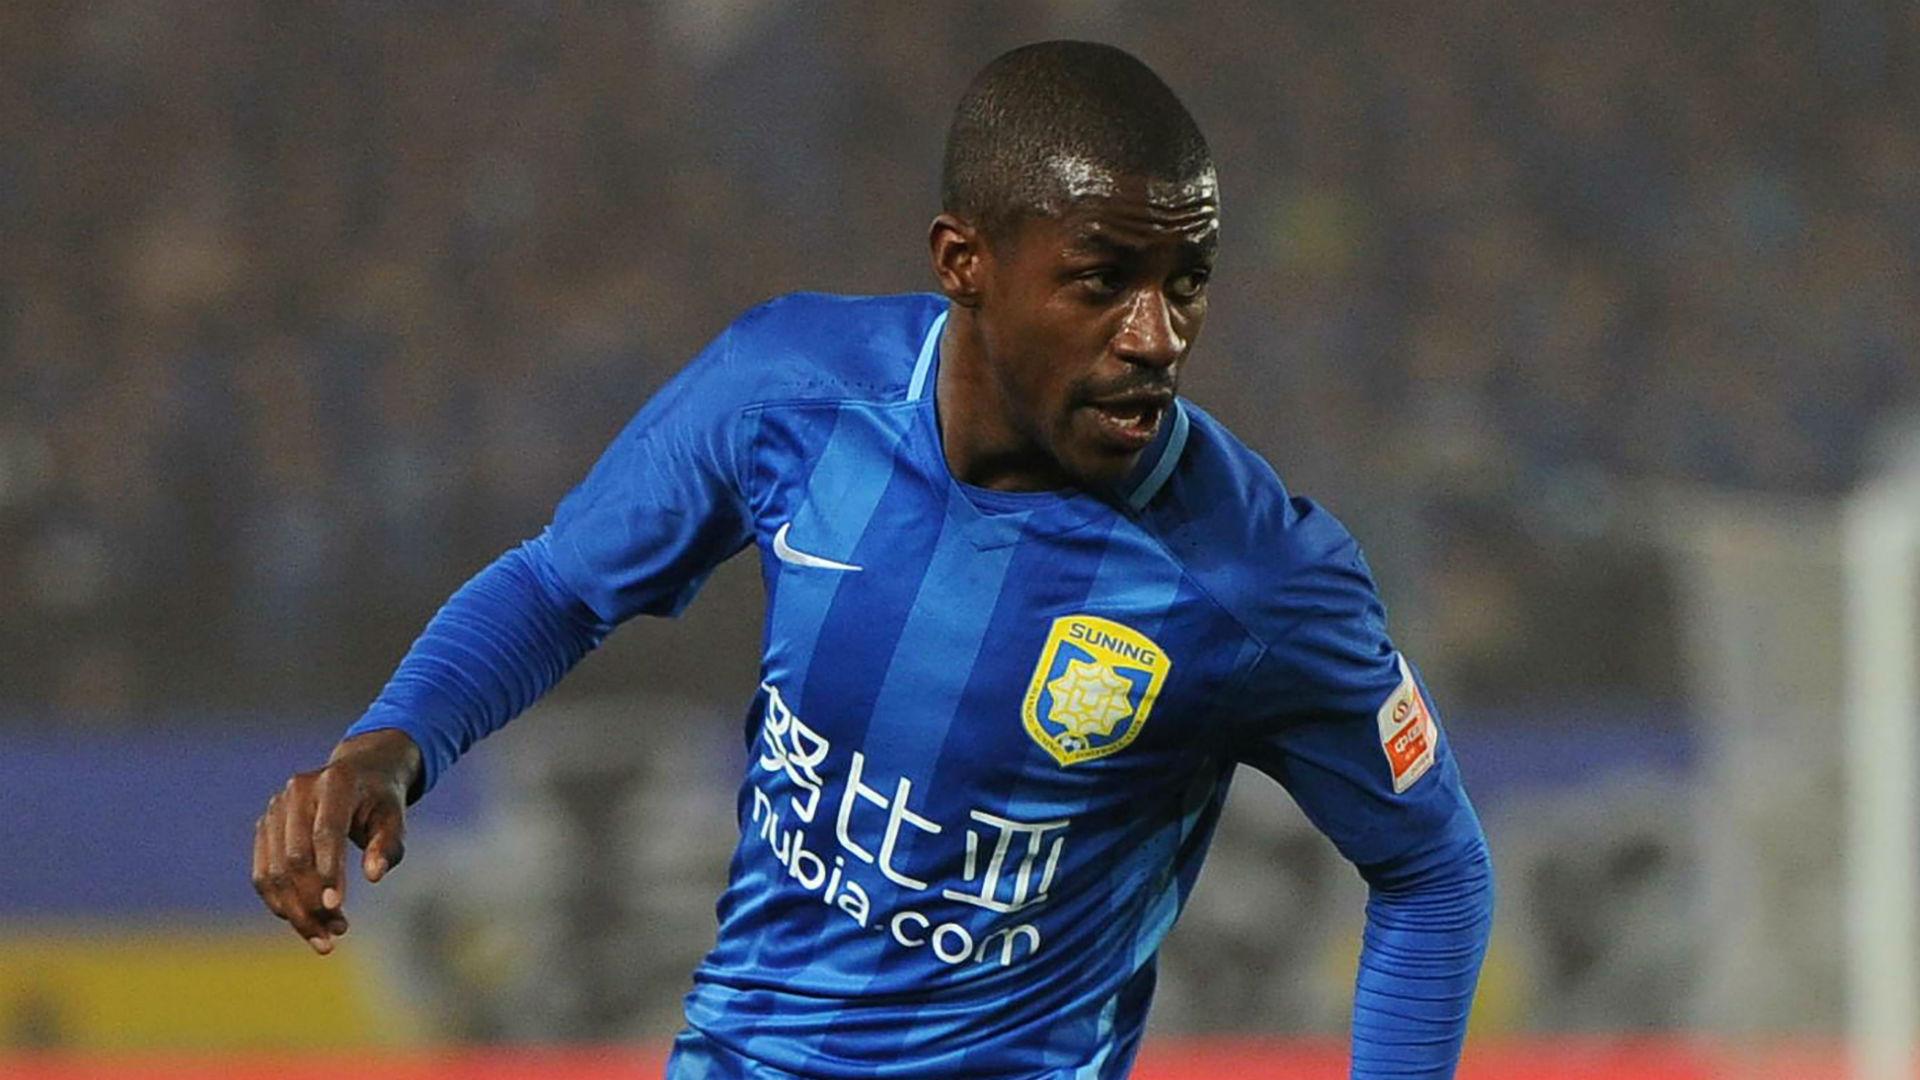 L'Inter in Cina ripesca Ramires